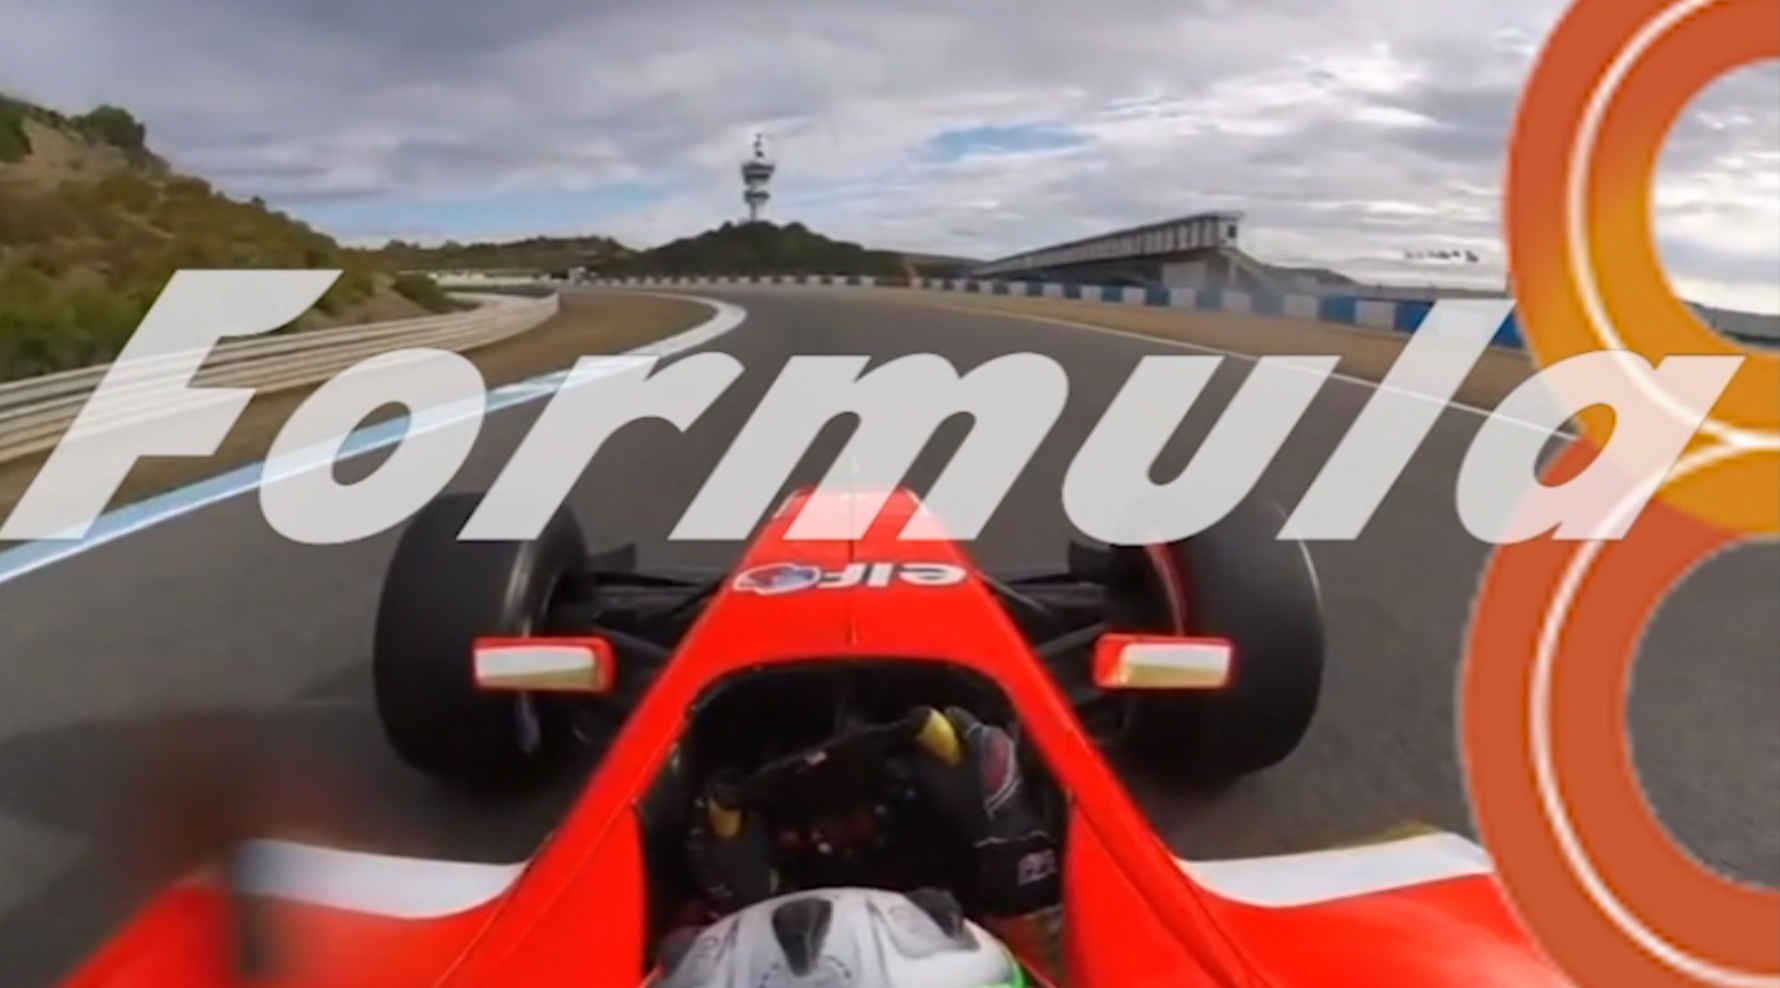 Fórmula 8 Jueves 10 Octubre 2019 (primera parte)